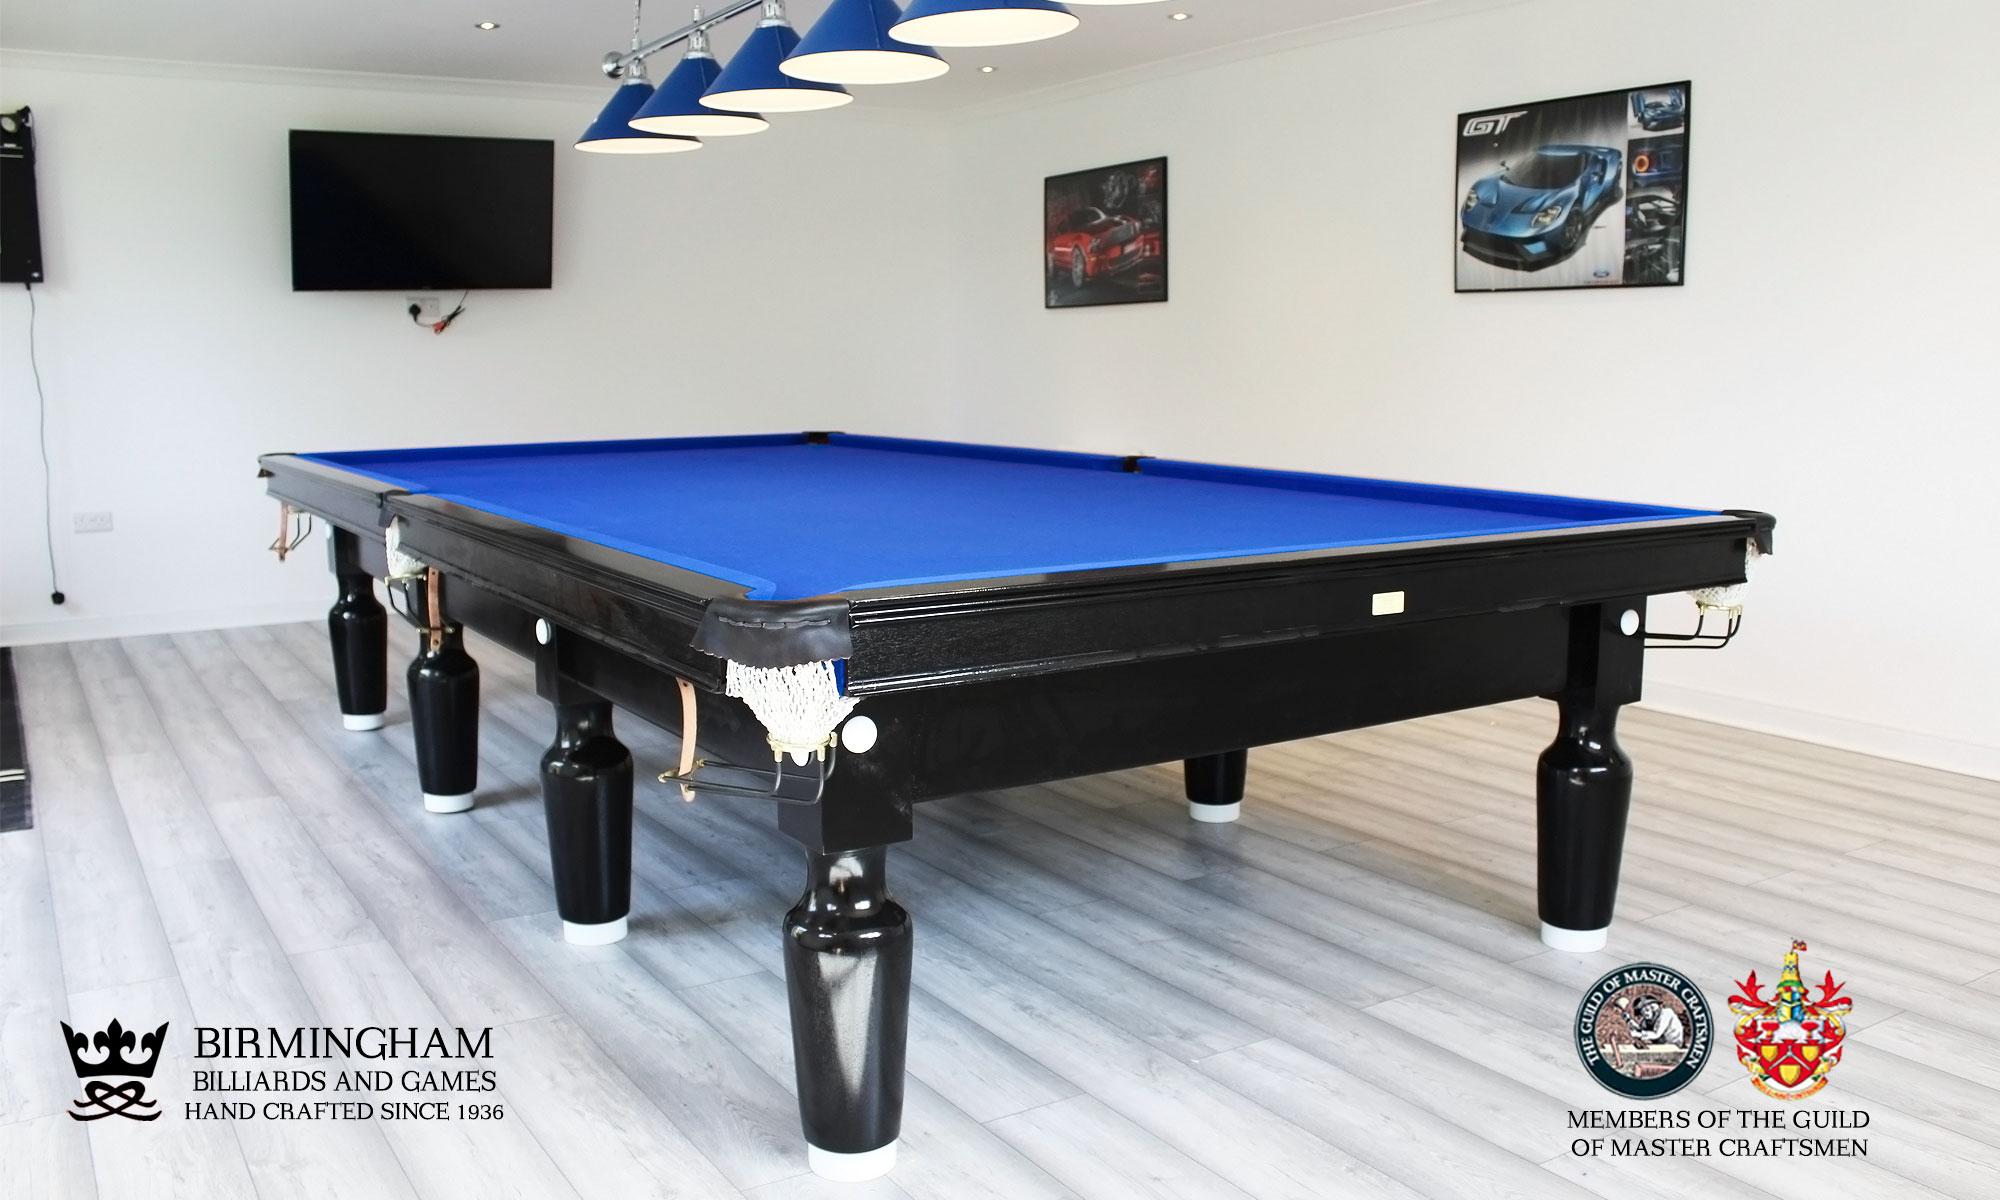 The Paris snooker table